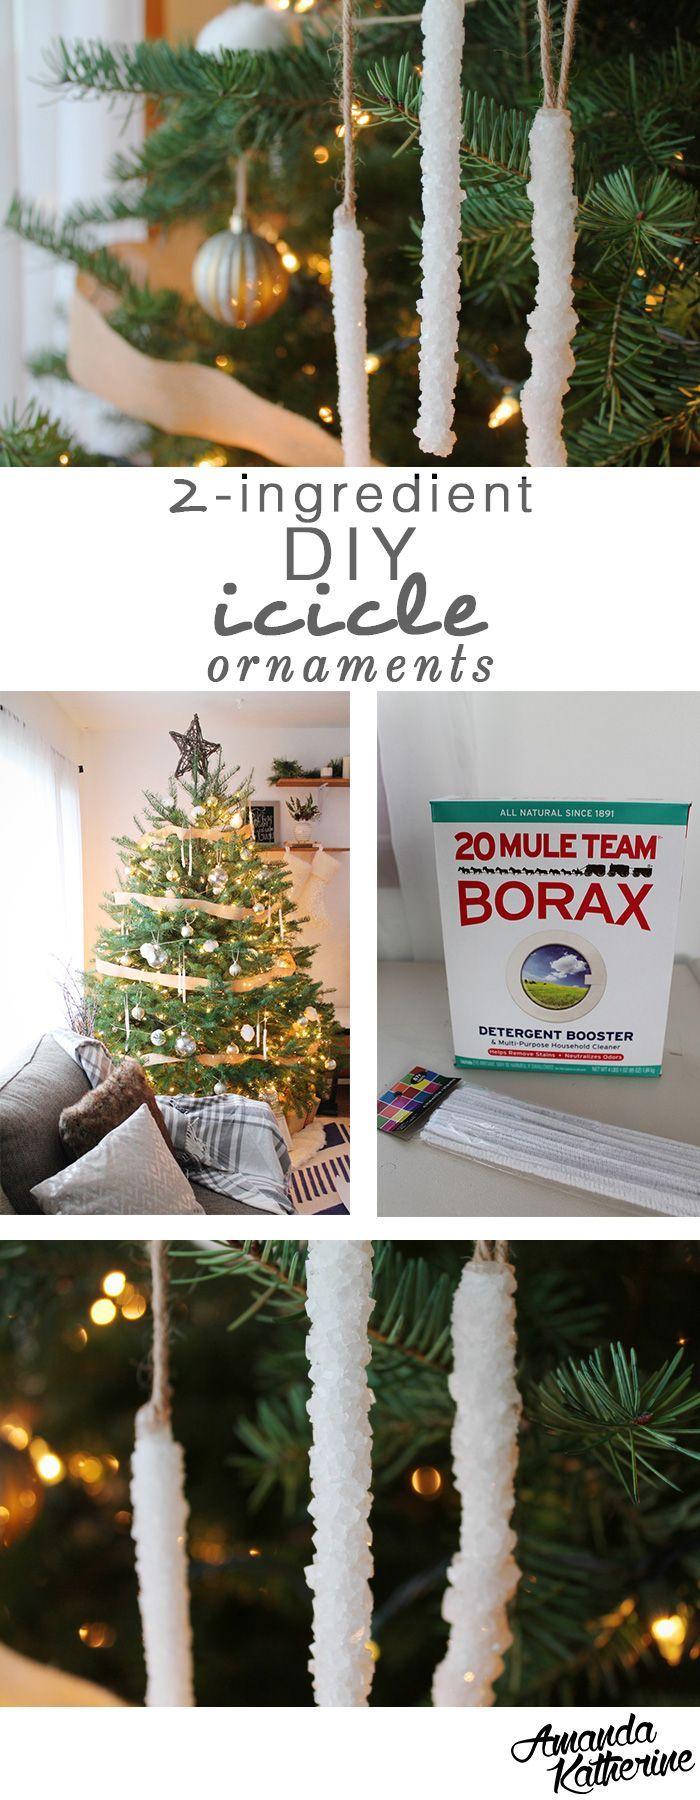 DIY Icicle Ornaments 1363 best Christmas ideas